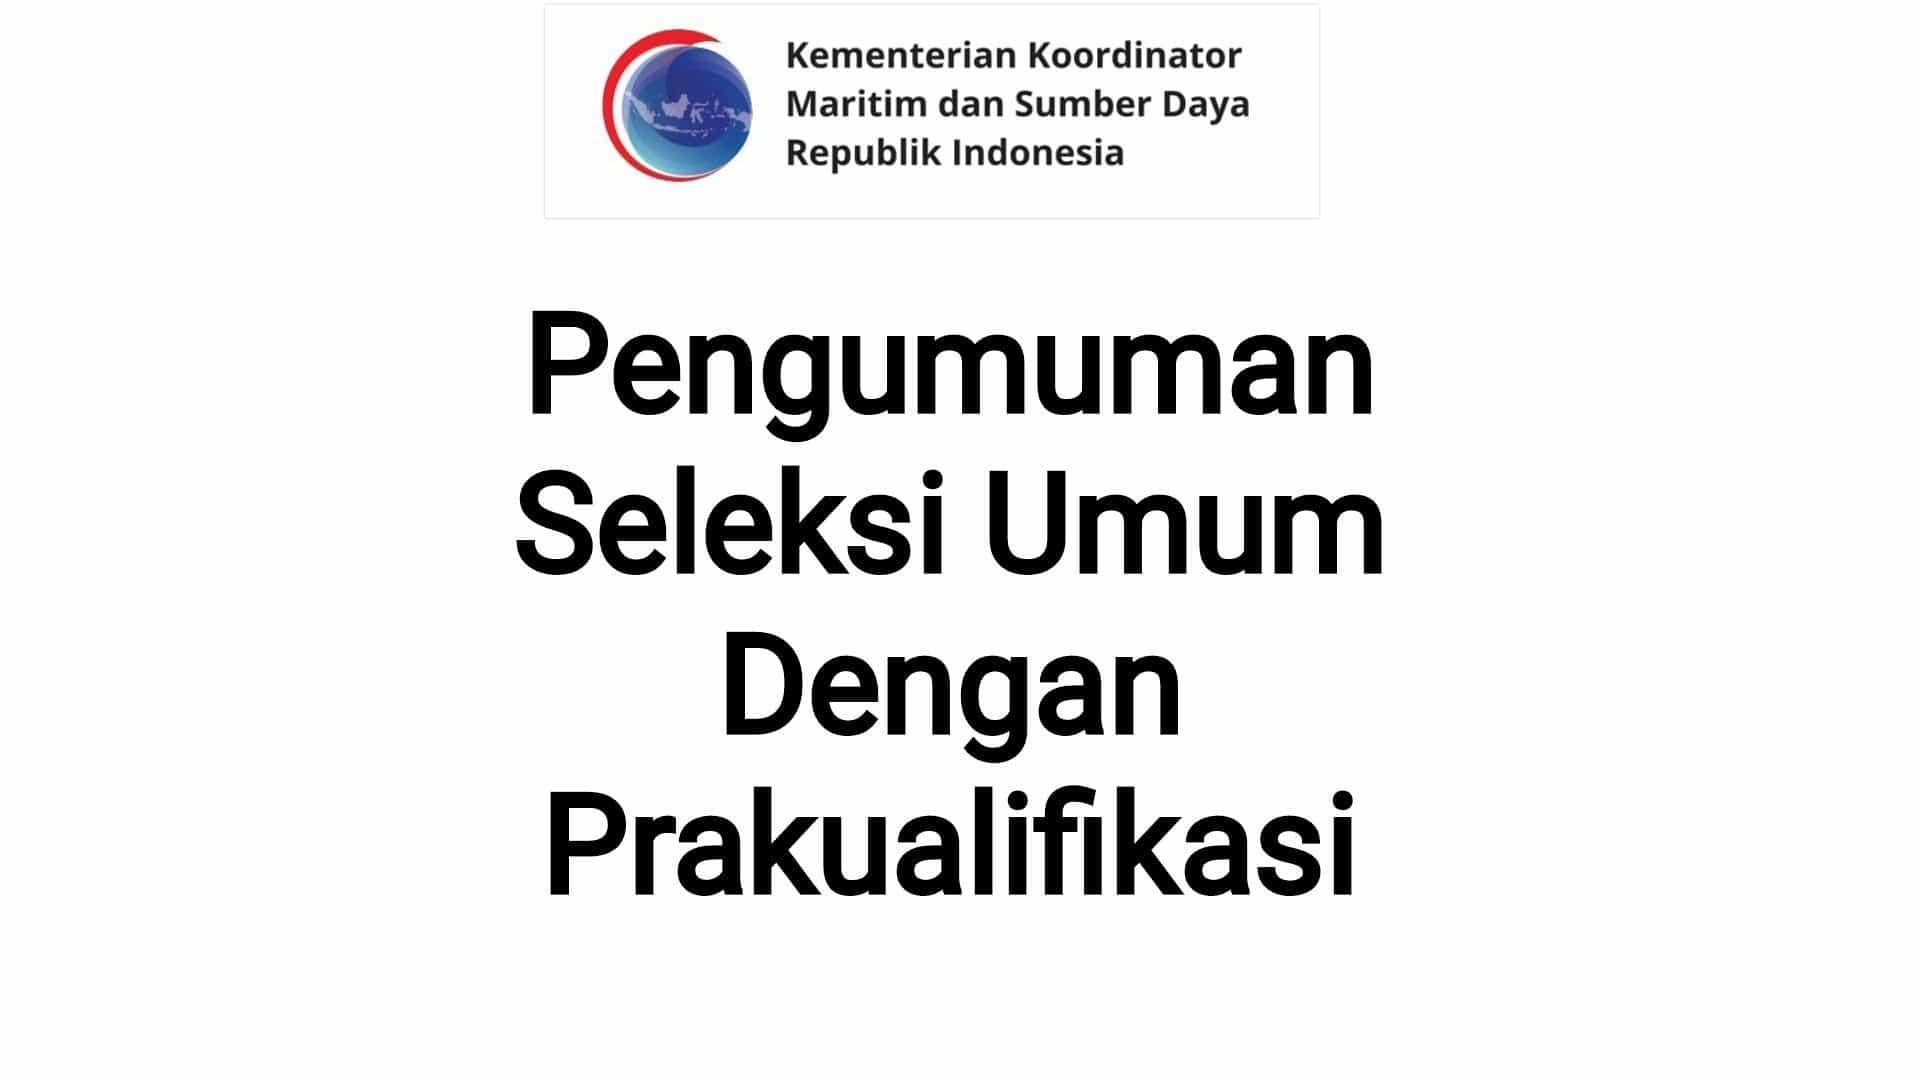 Seleksi Umum dengan Prakualifikasi Jasa Konsultansi Renovasi Gedung